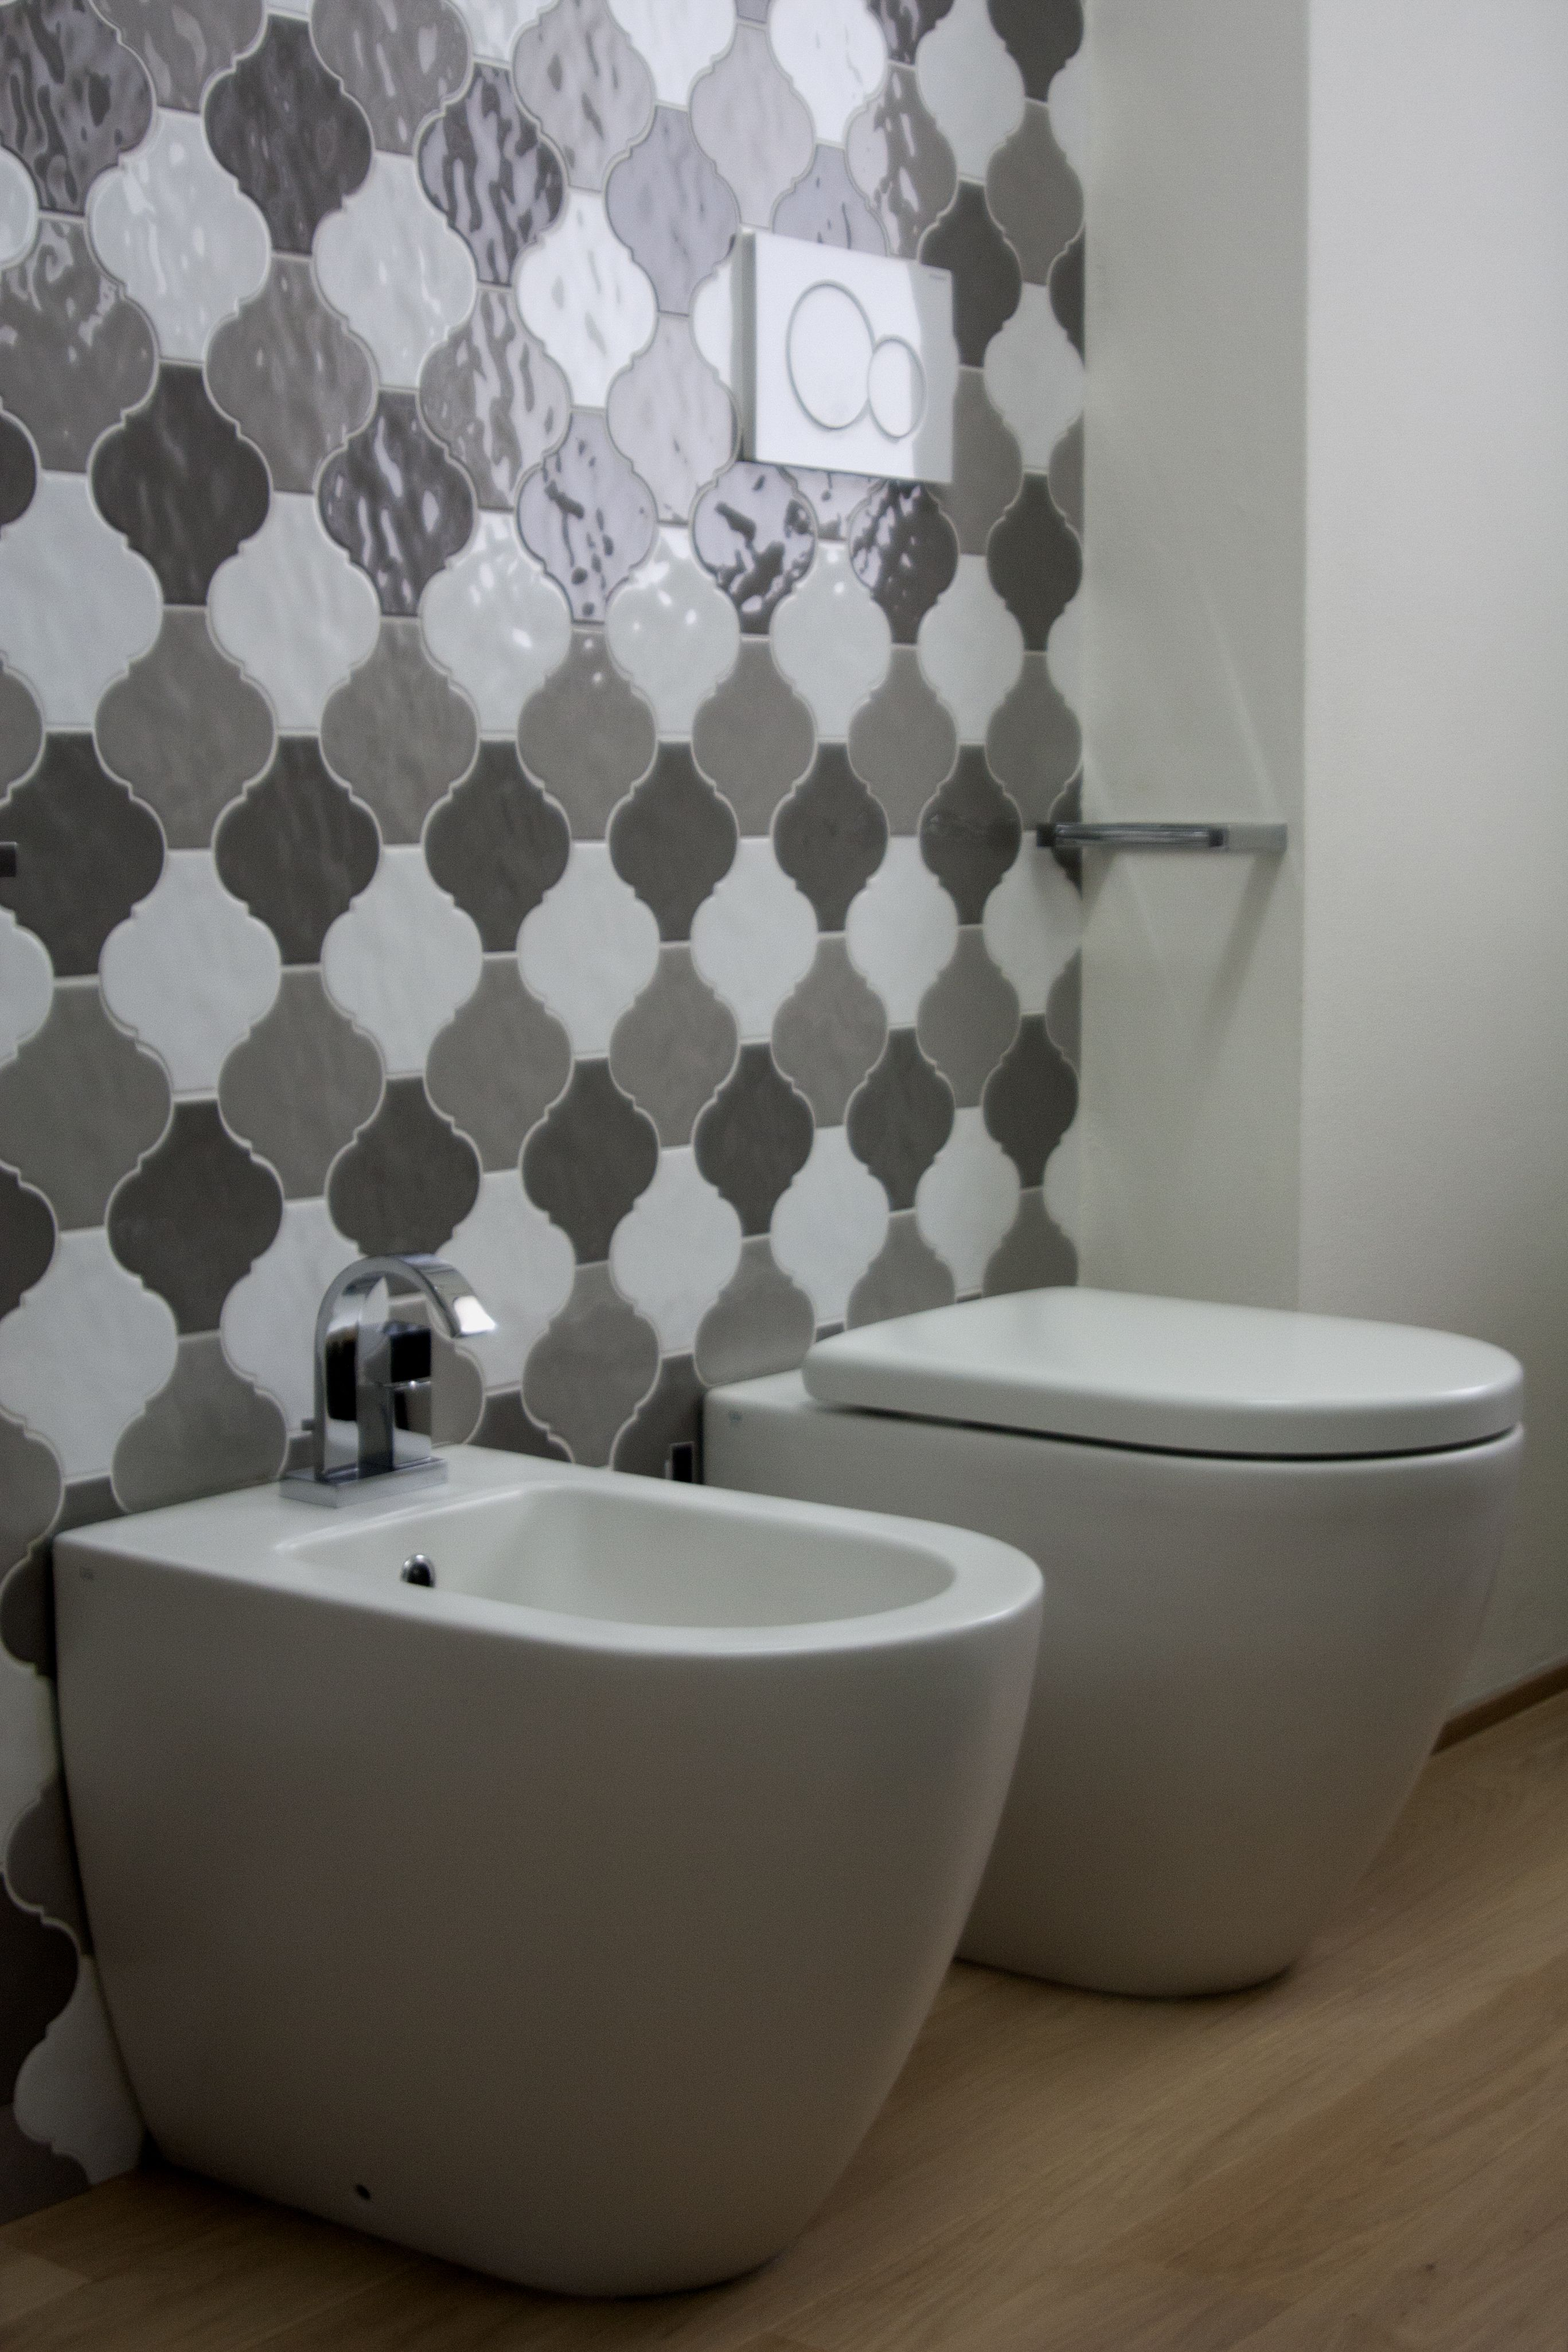 Mosaic liners art pattern mirrorred bathroom wall discount tiles - Home Tonalite Tiles Tonalite